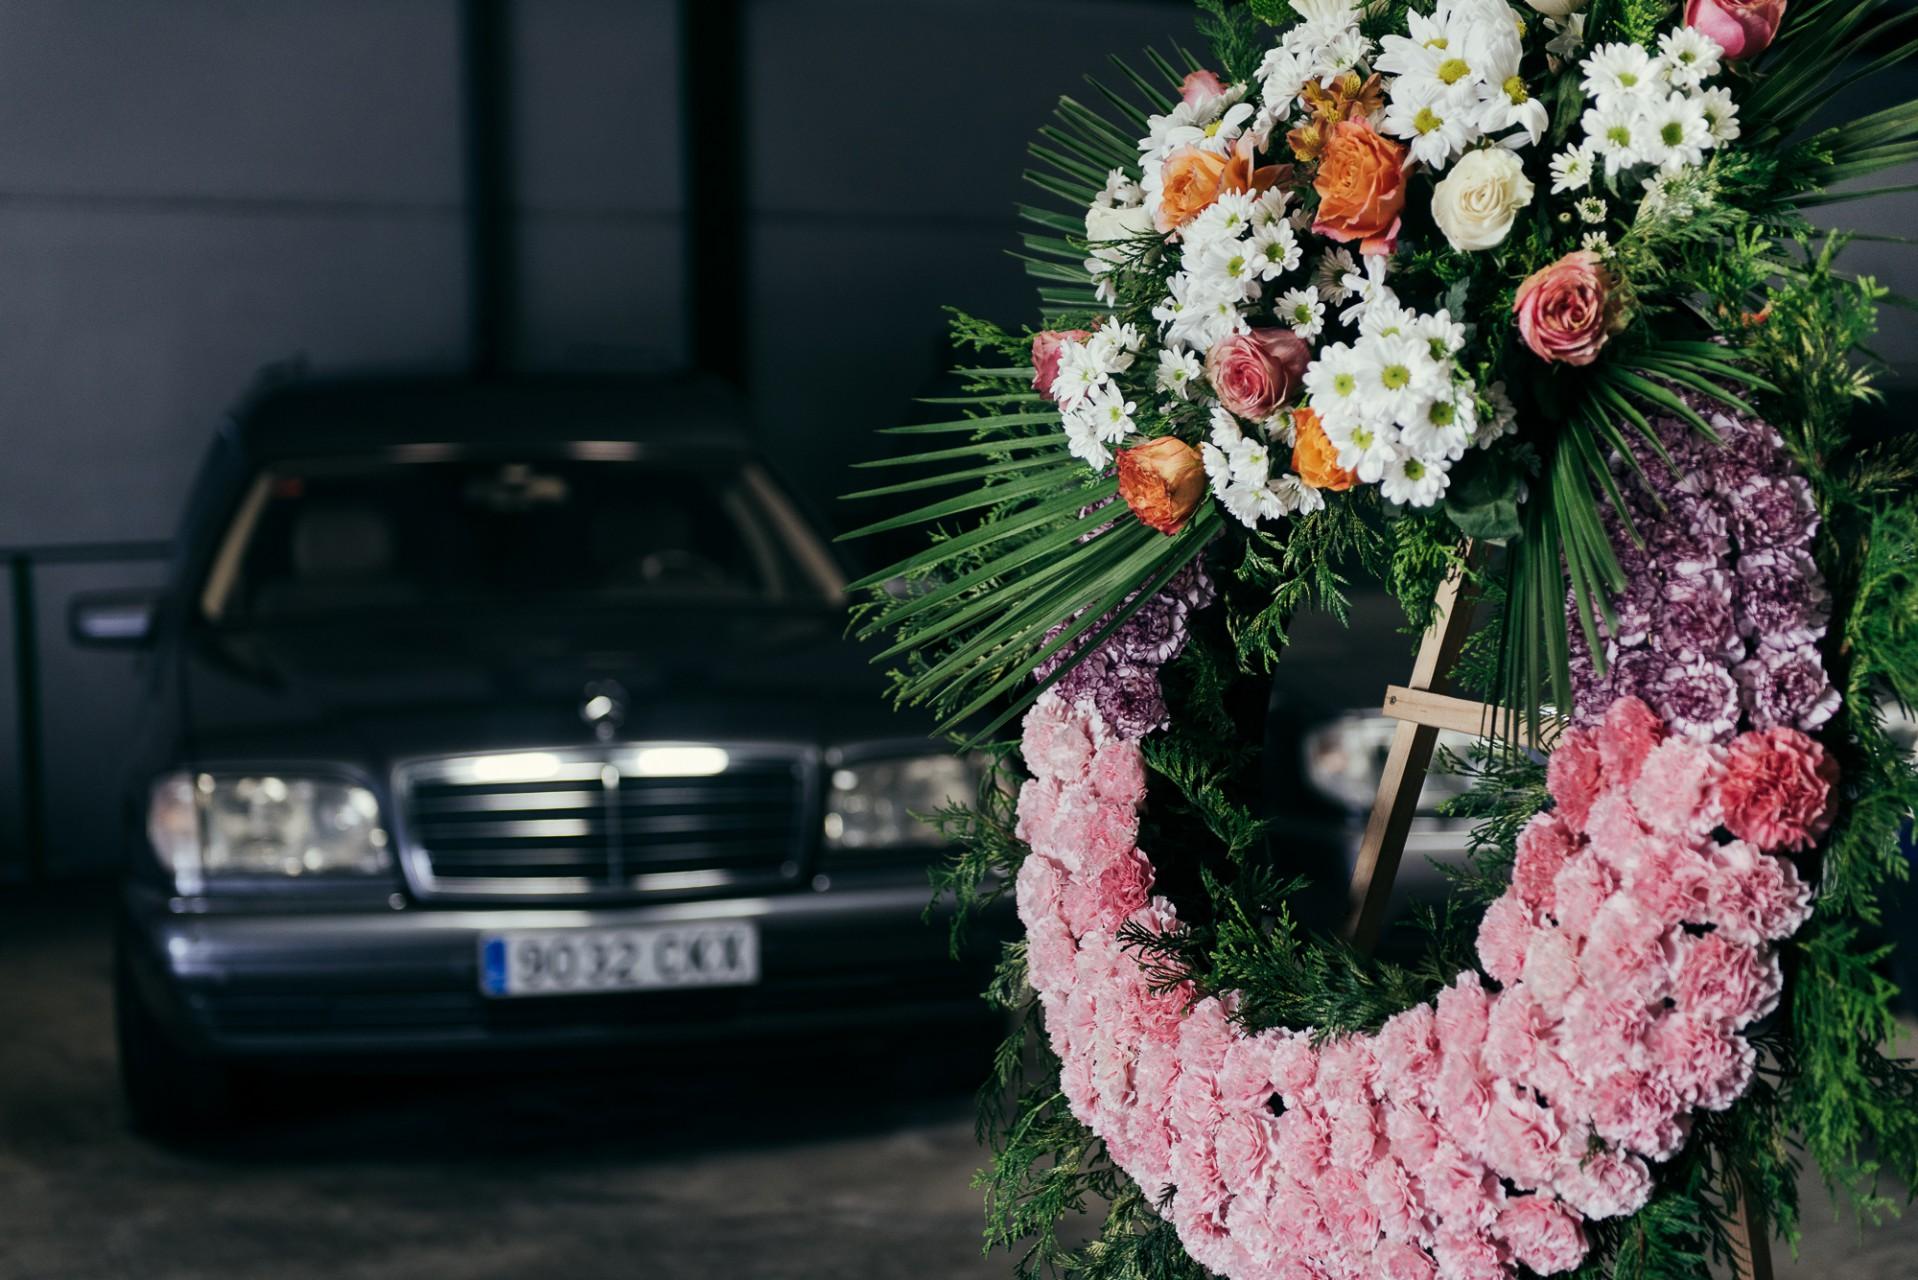 Ana Matos - sector funerario 2015-18